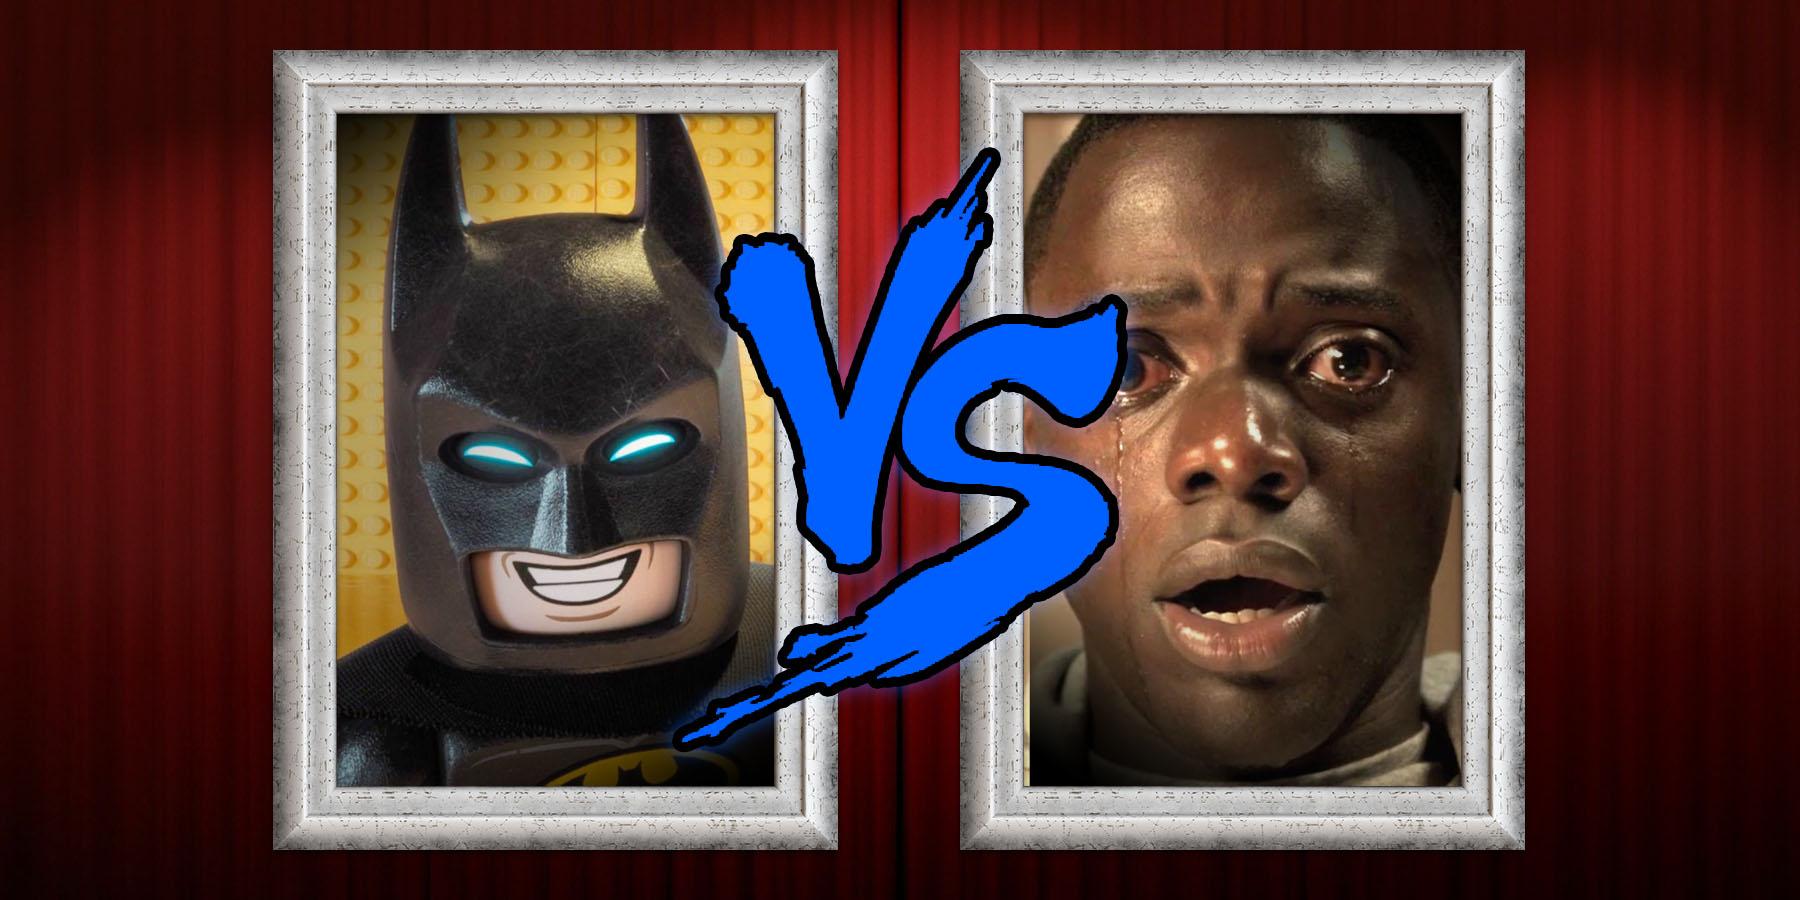 2017 Box Office - LEGO Batman vs Get Out